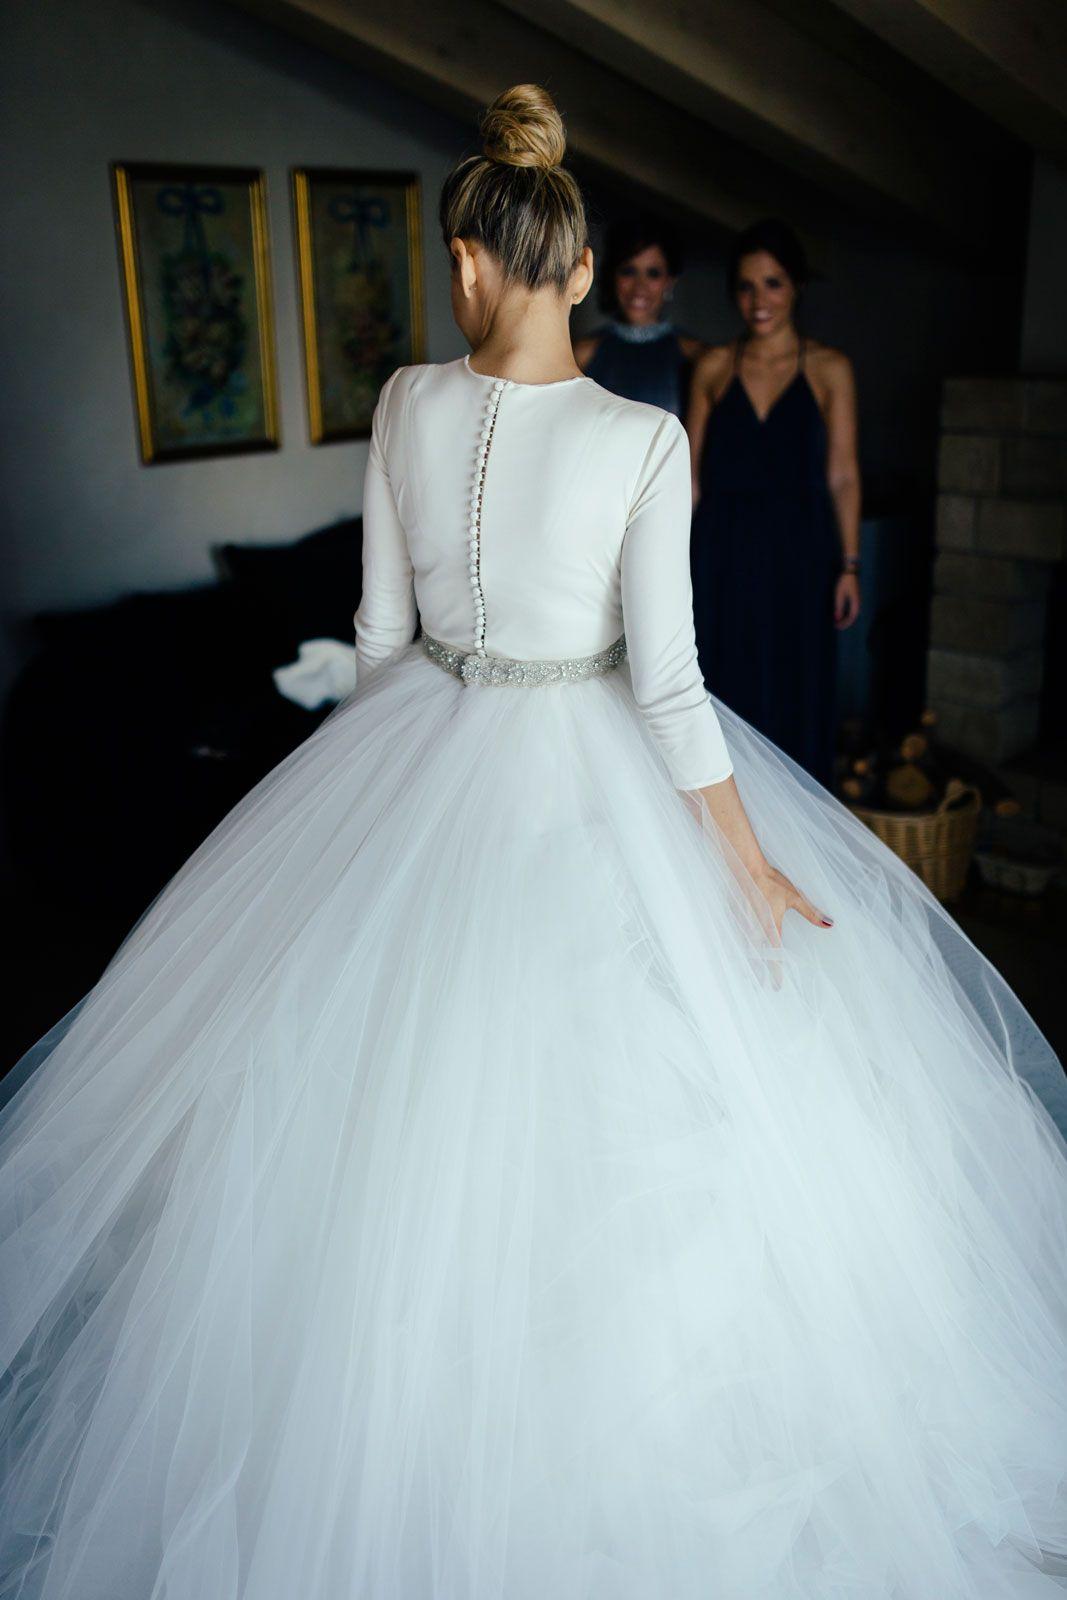 Rosa Clara boda | wedding dresses | Pinterest | Rosas, Boda y Novios